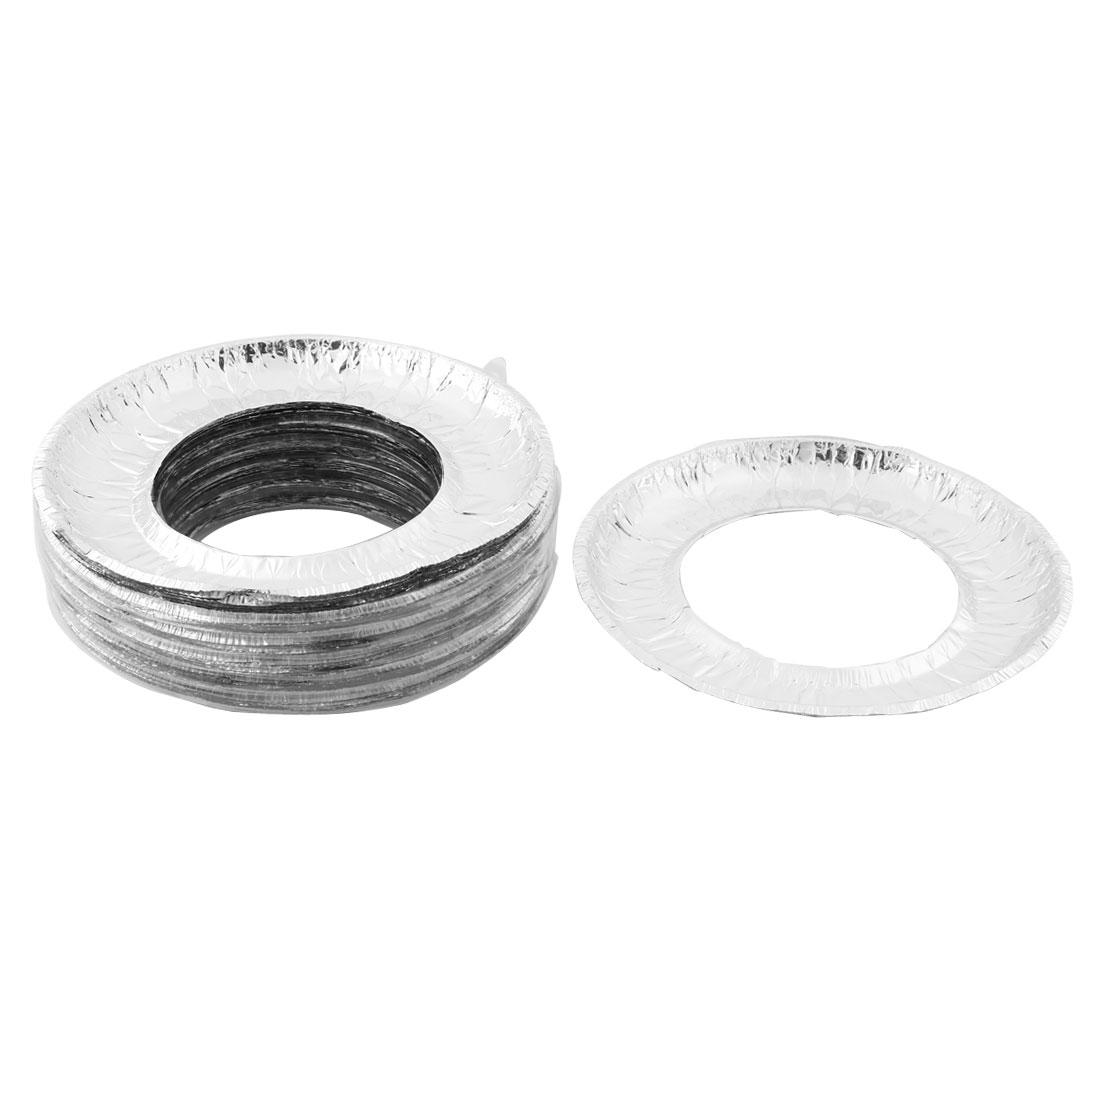 Kitchenware Aluminum Foil Round Shaped Stove Burner Bib Liners Covers 60 PCS